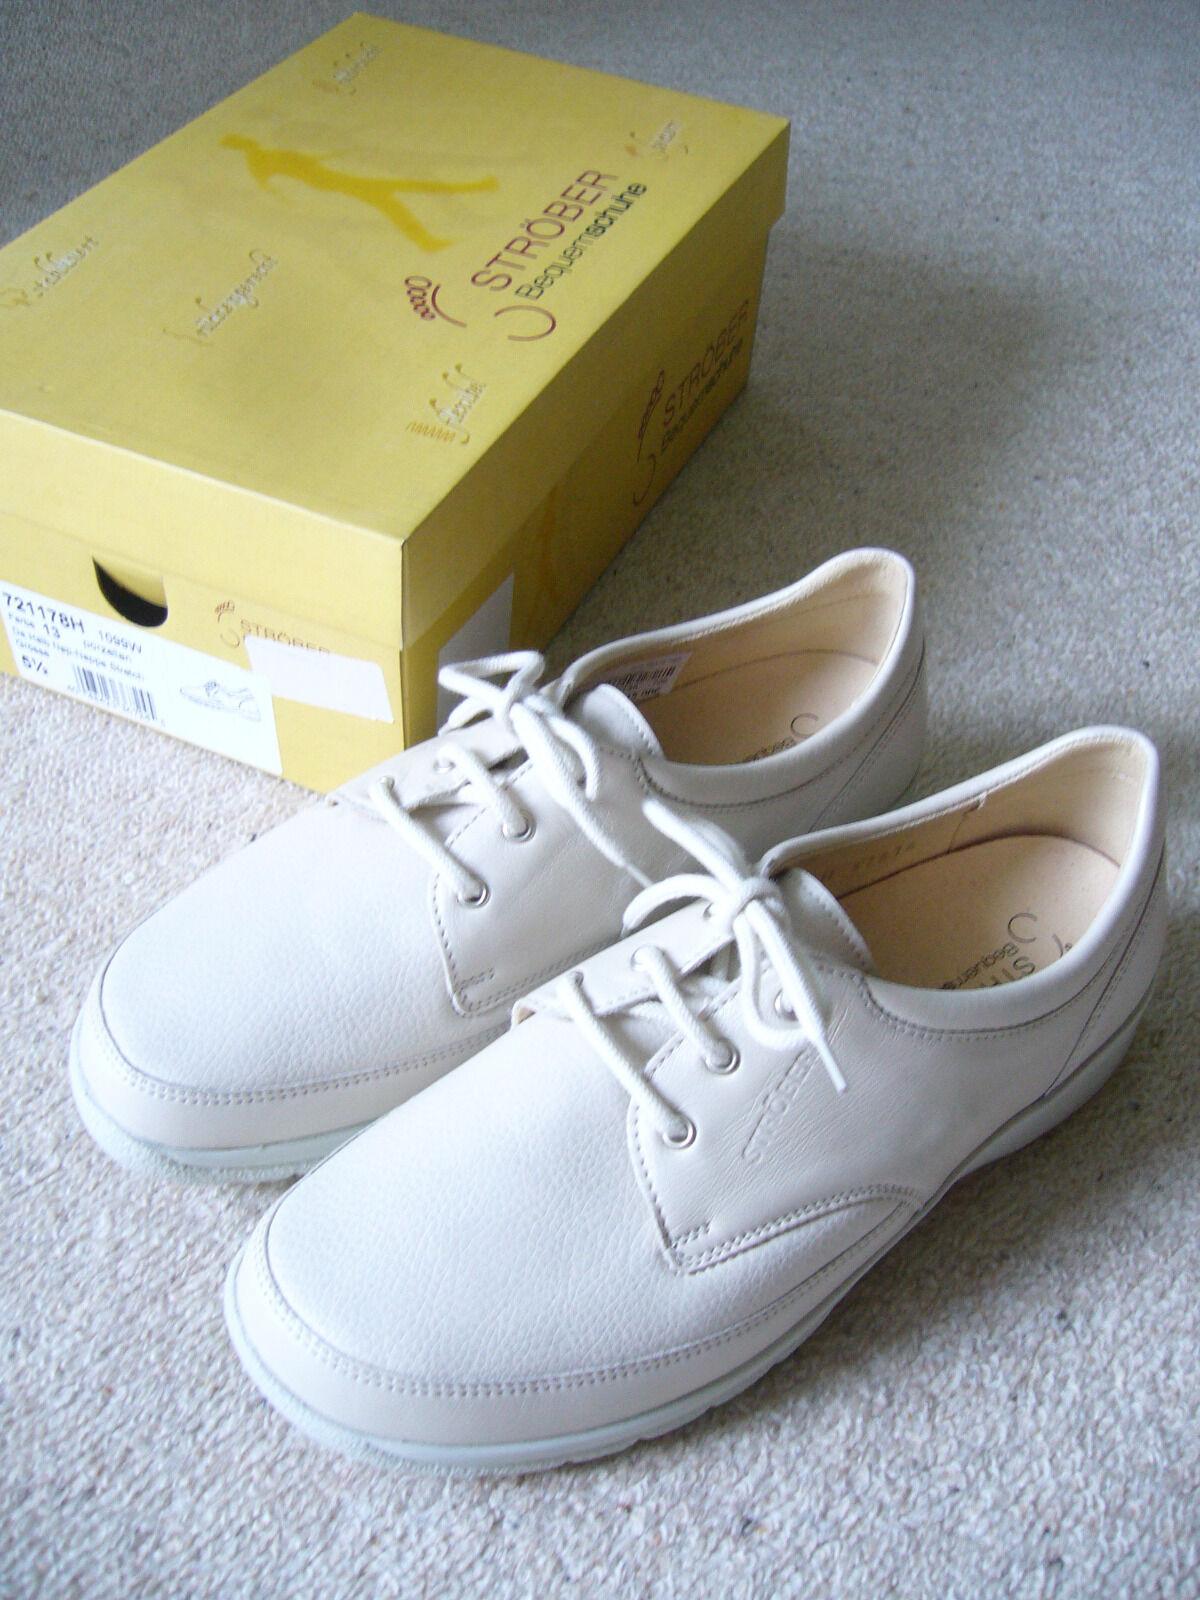 56851bce824 Nike LeBron Soldier XI 11 WHITE WHITE WHITE ICE PURE PLATINUM 897644-103 sz  10.5 ...